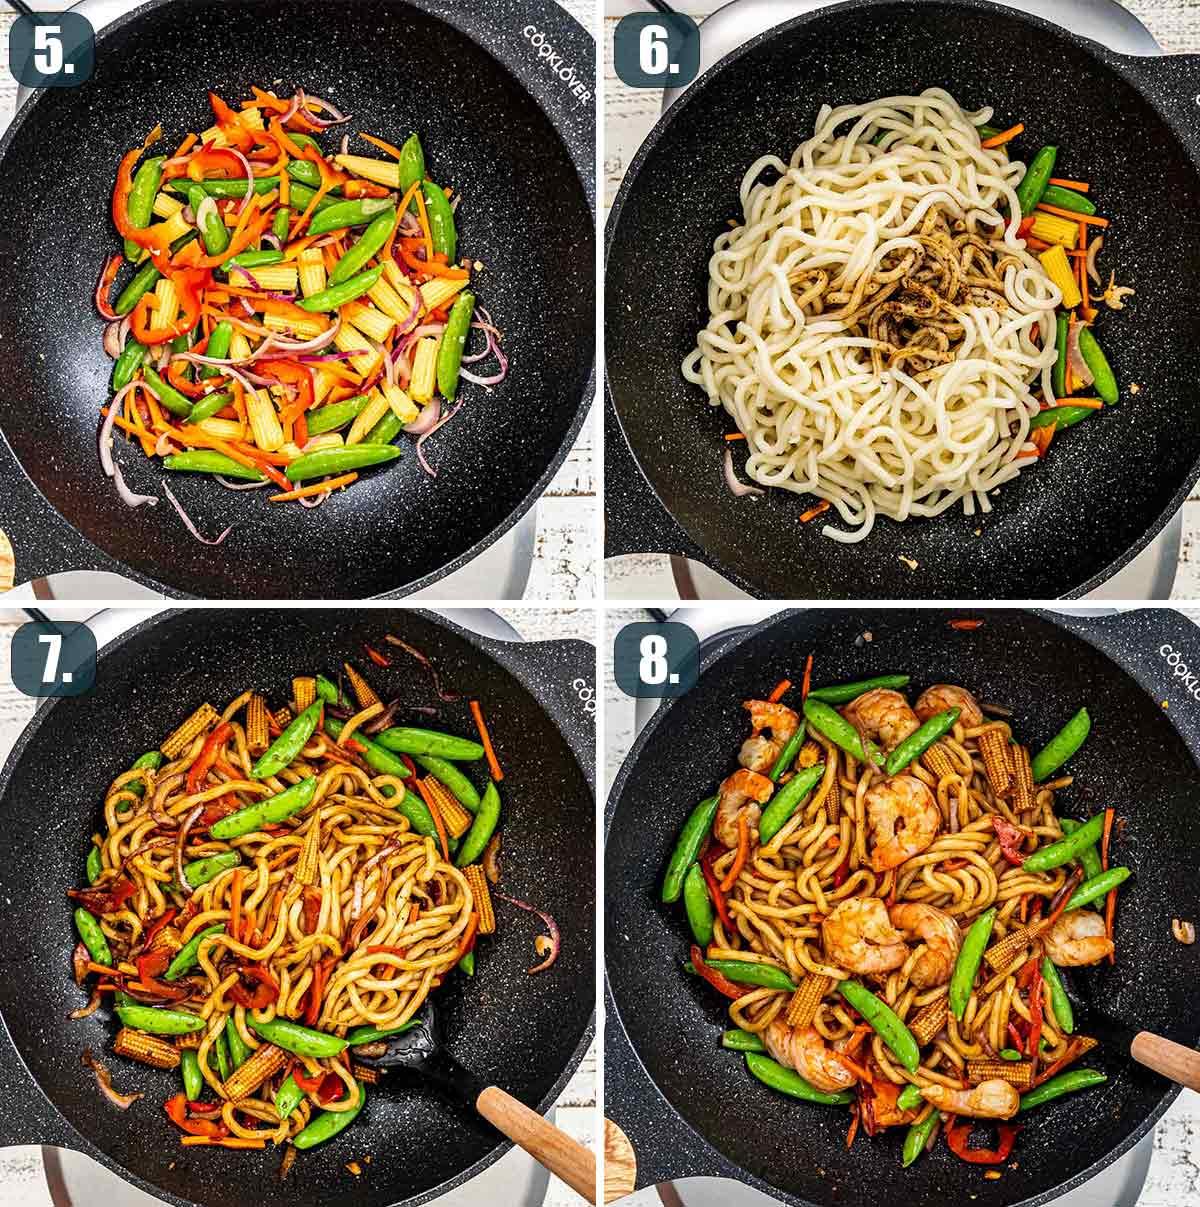 process shots showing how to make black pepper udon noodles with shrimp.